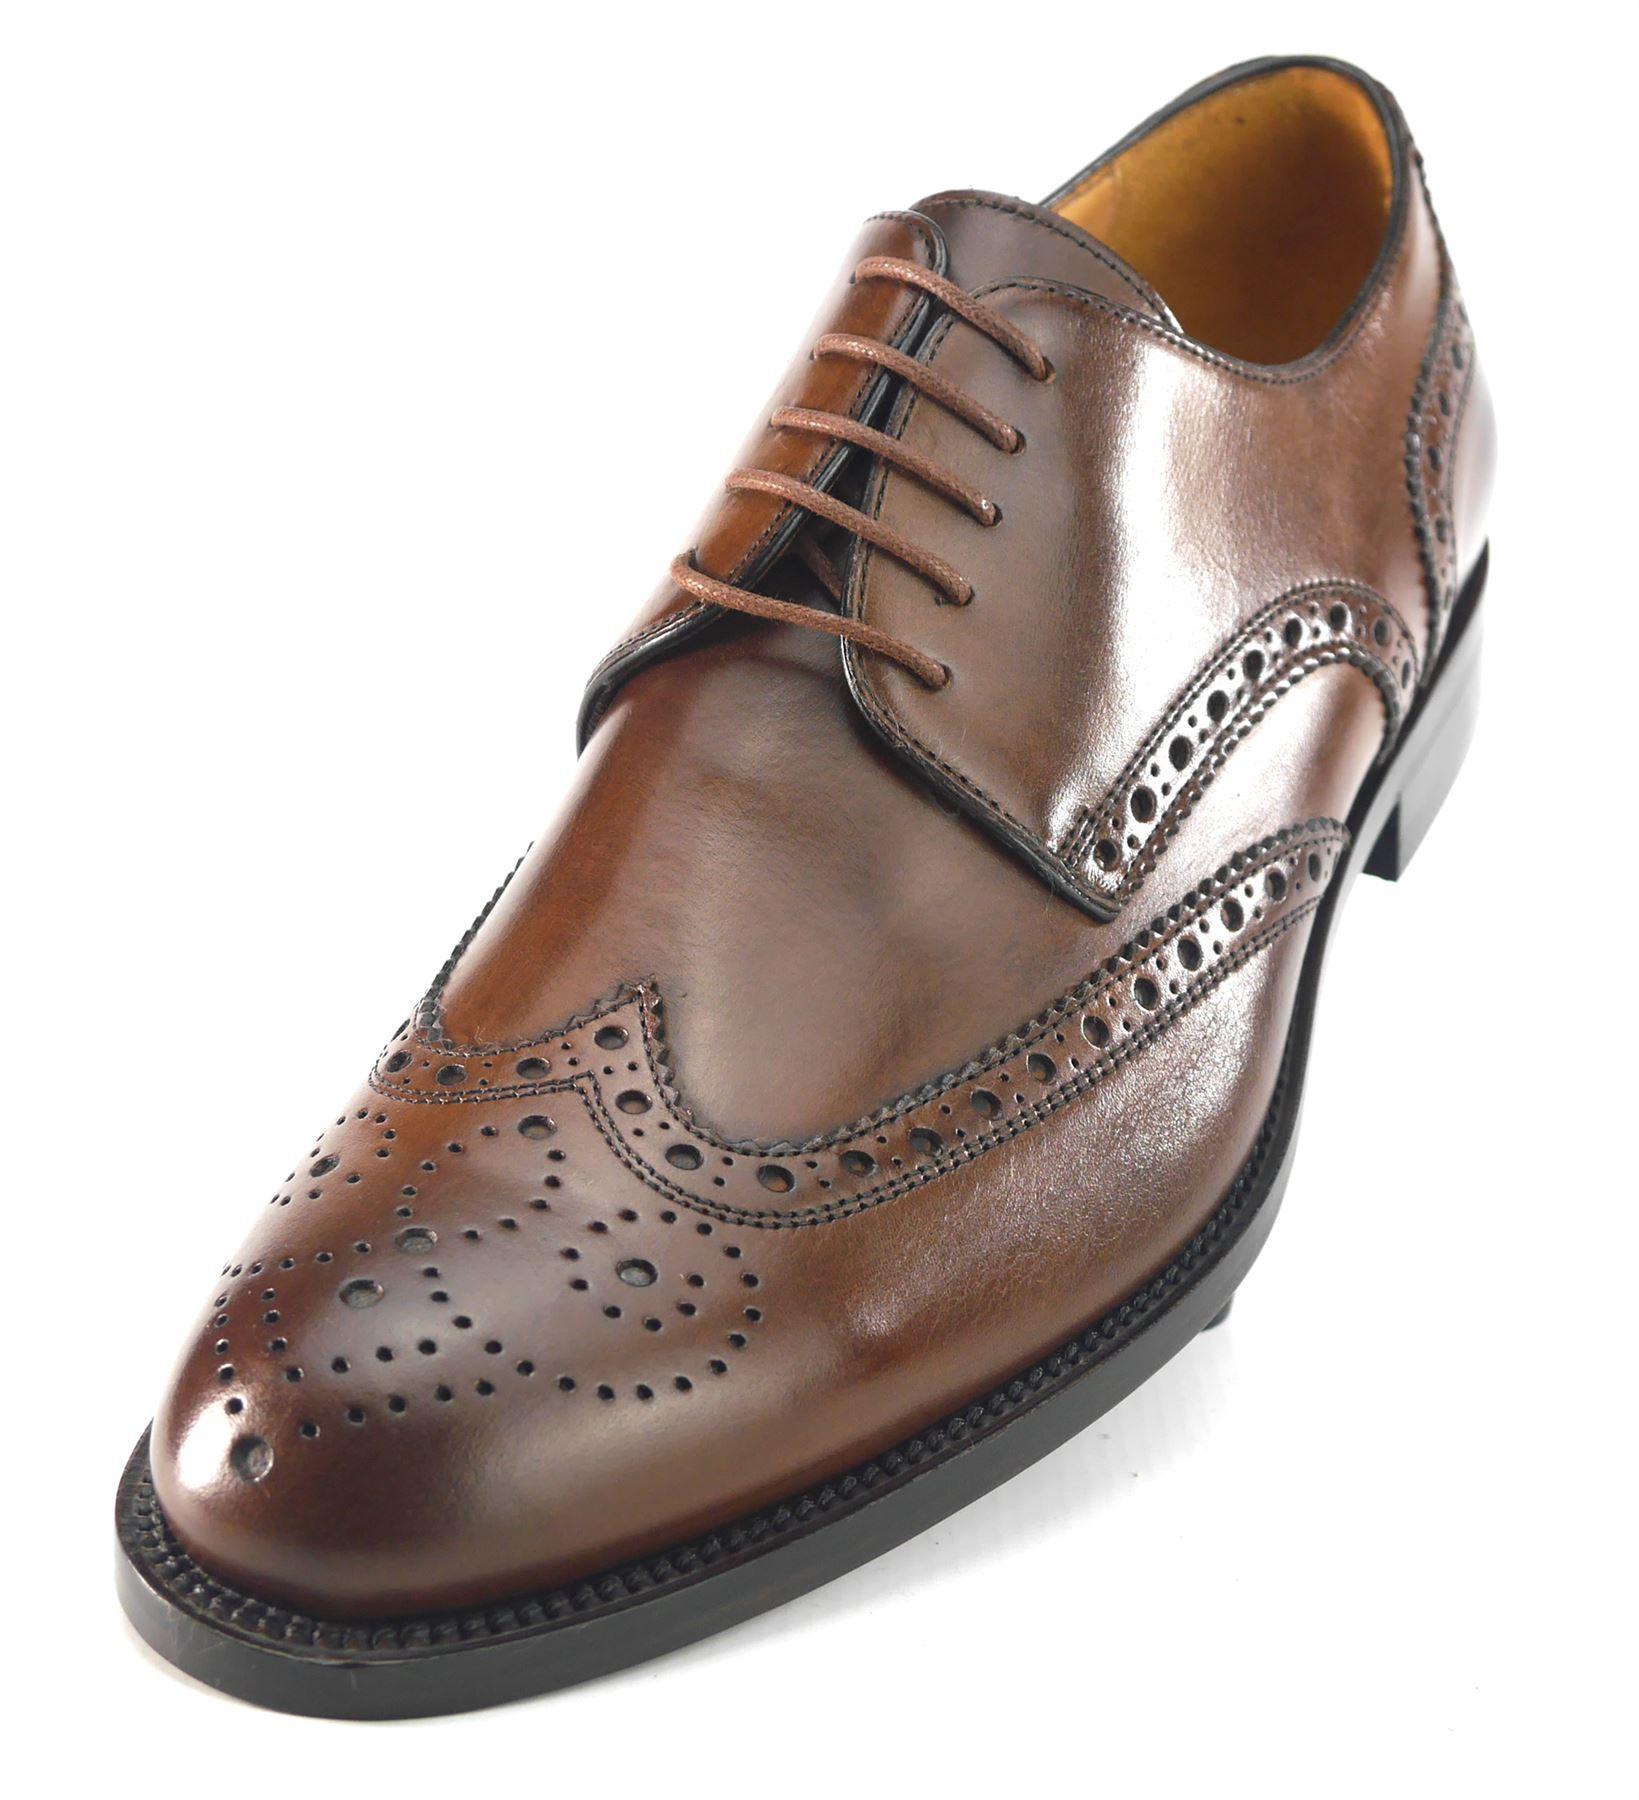 Mercanti Fiorentini  Kenia 5792 Braun Leder Wingtip  Fiorentini Uomo Brogue Brandy 63c552